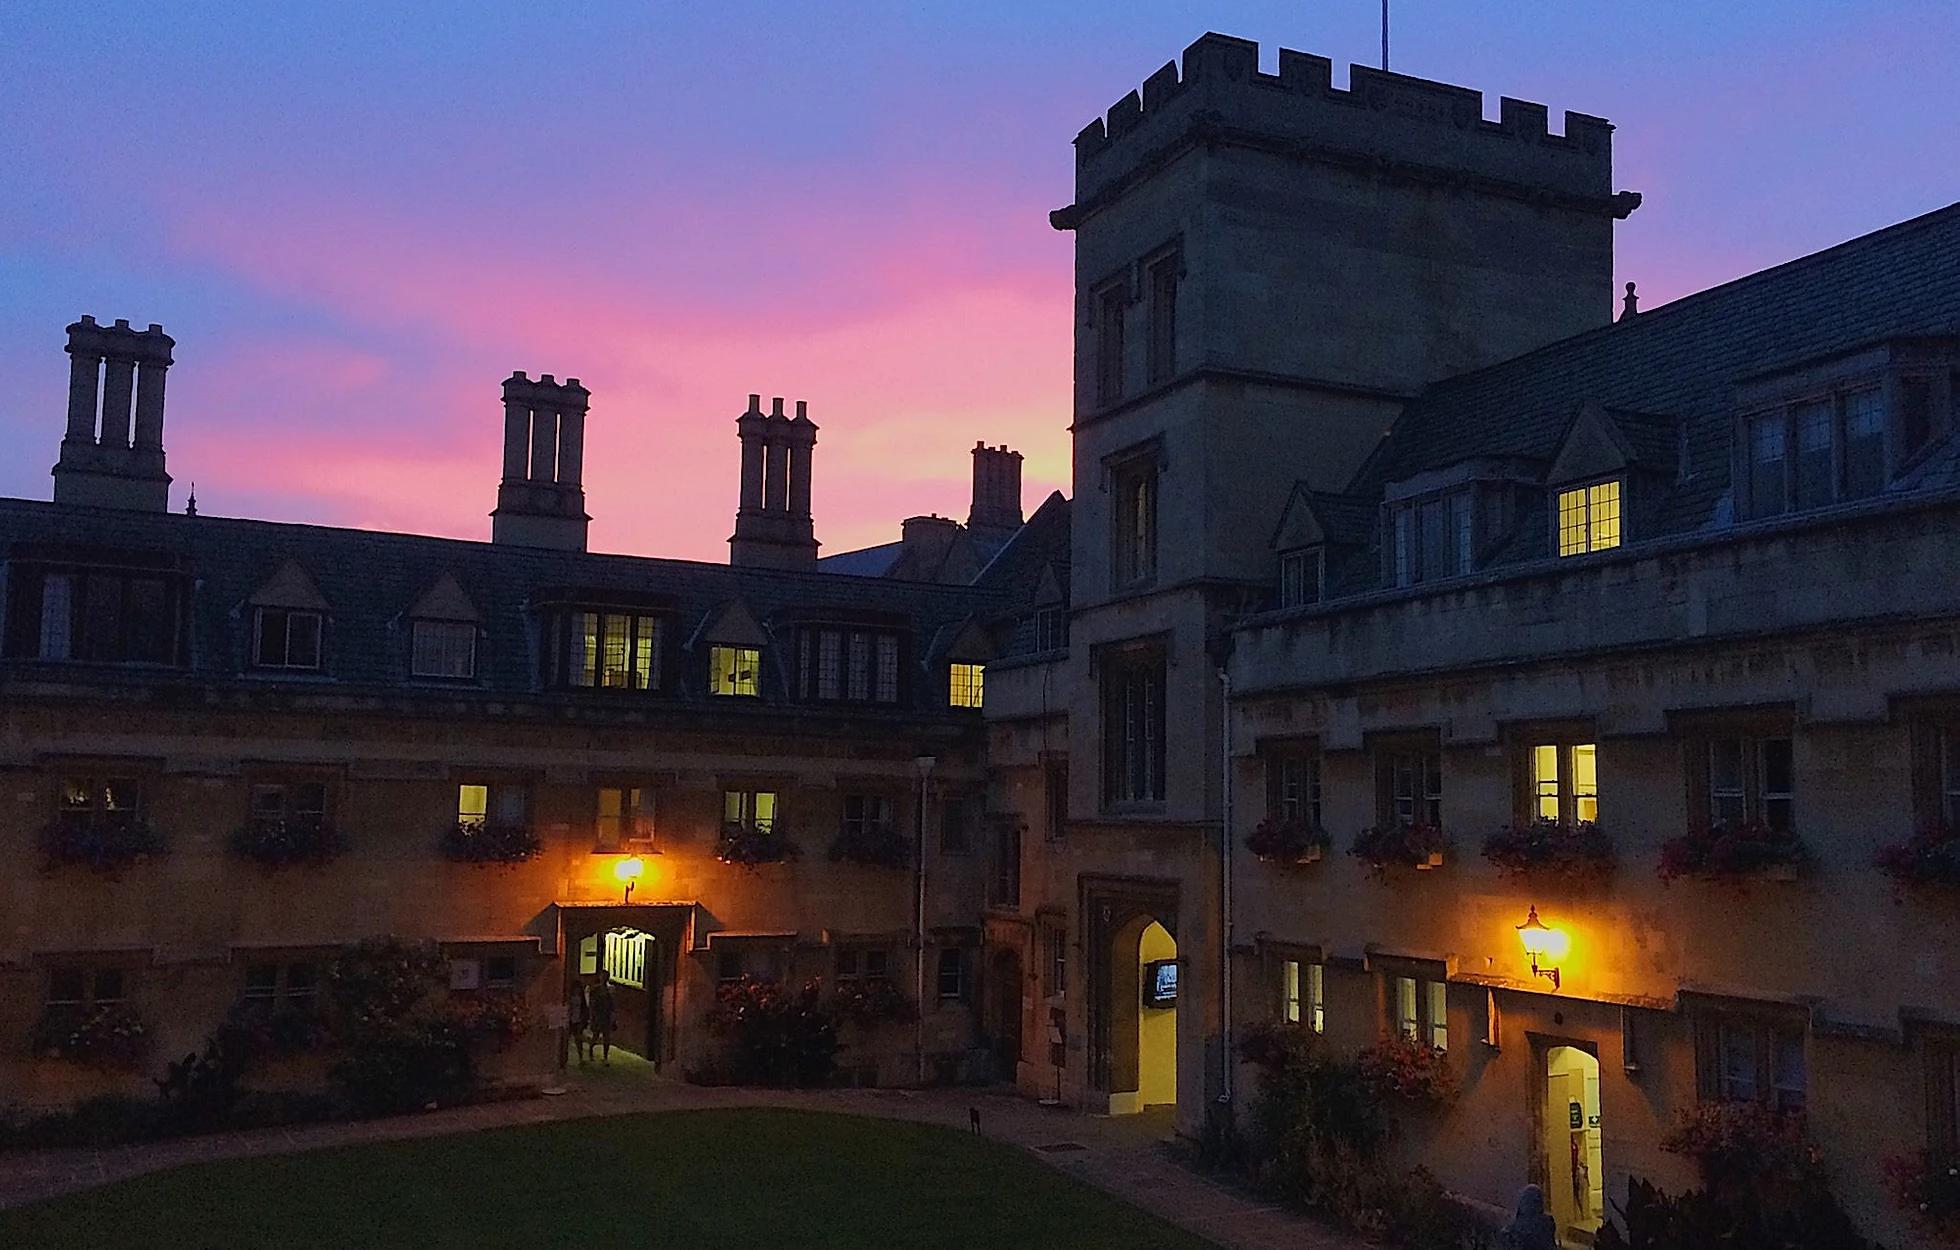 Memories of Renaissance at Oxford